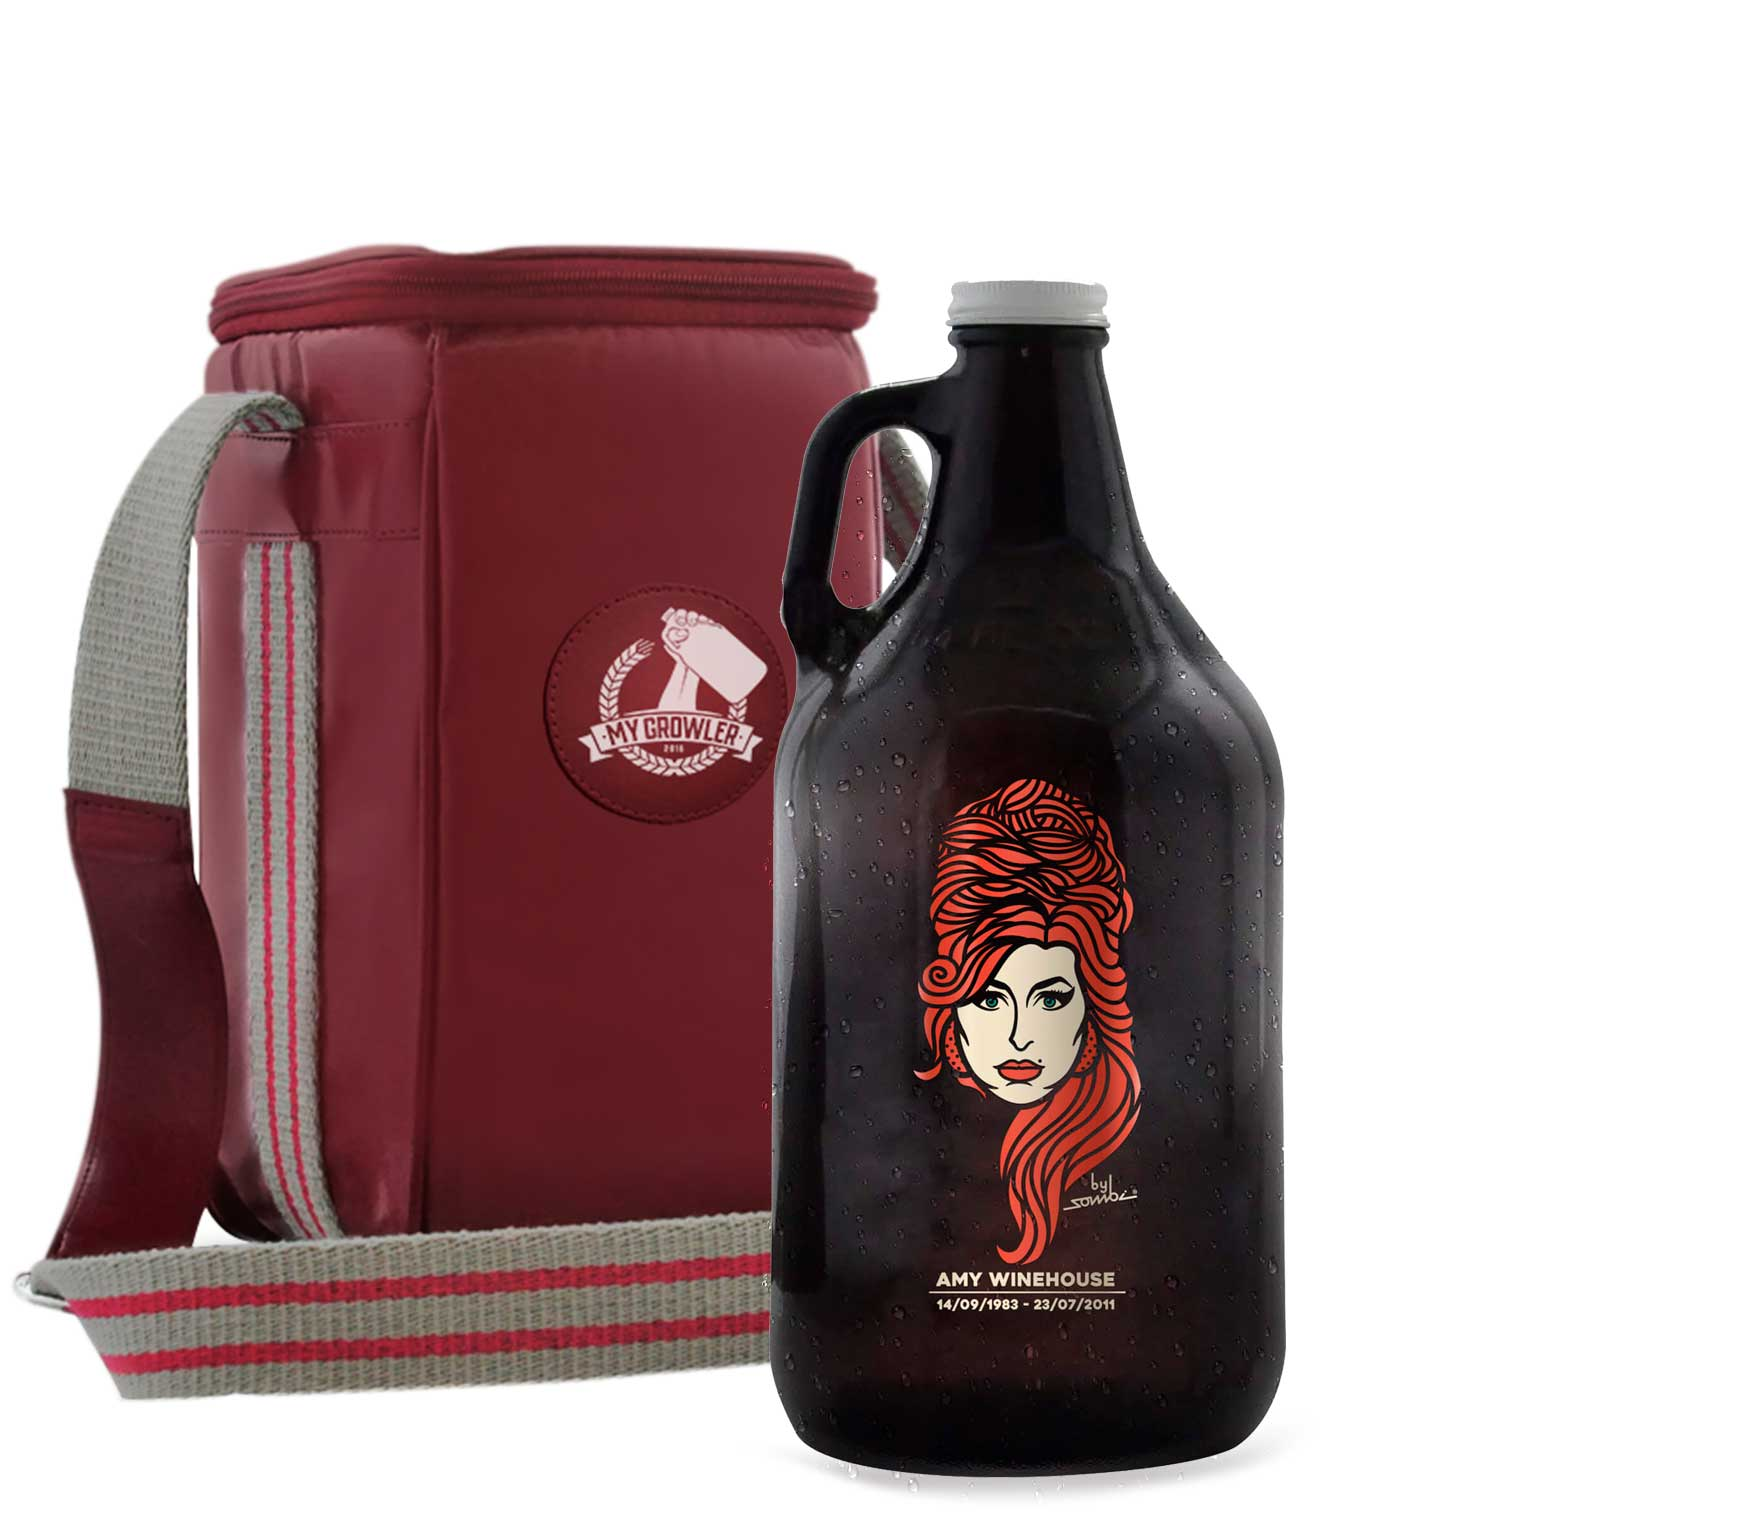 Growler Americano 1,89l - Amy Winehouse + Growler Bag Travel